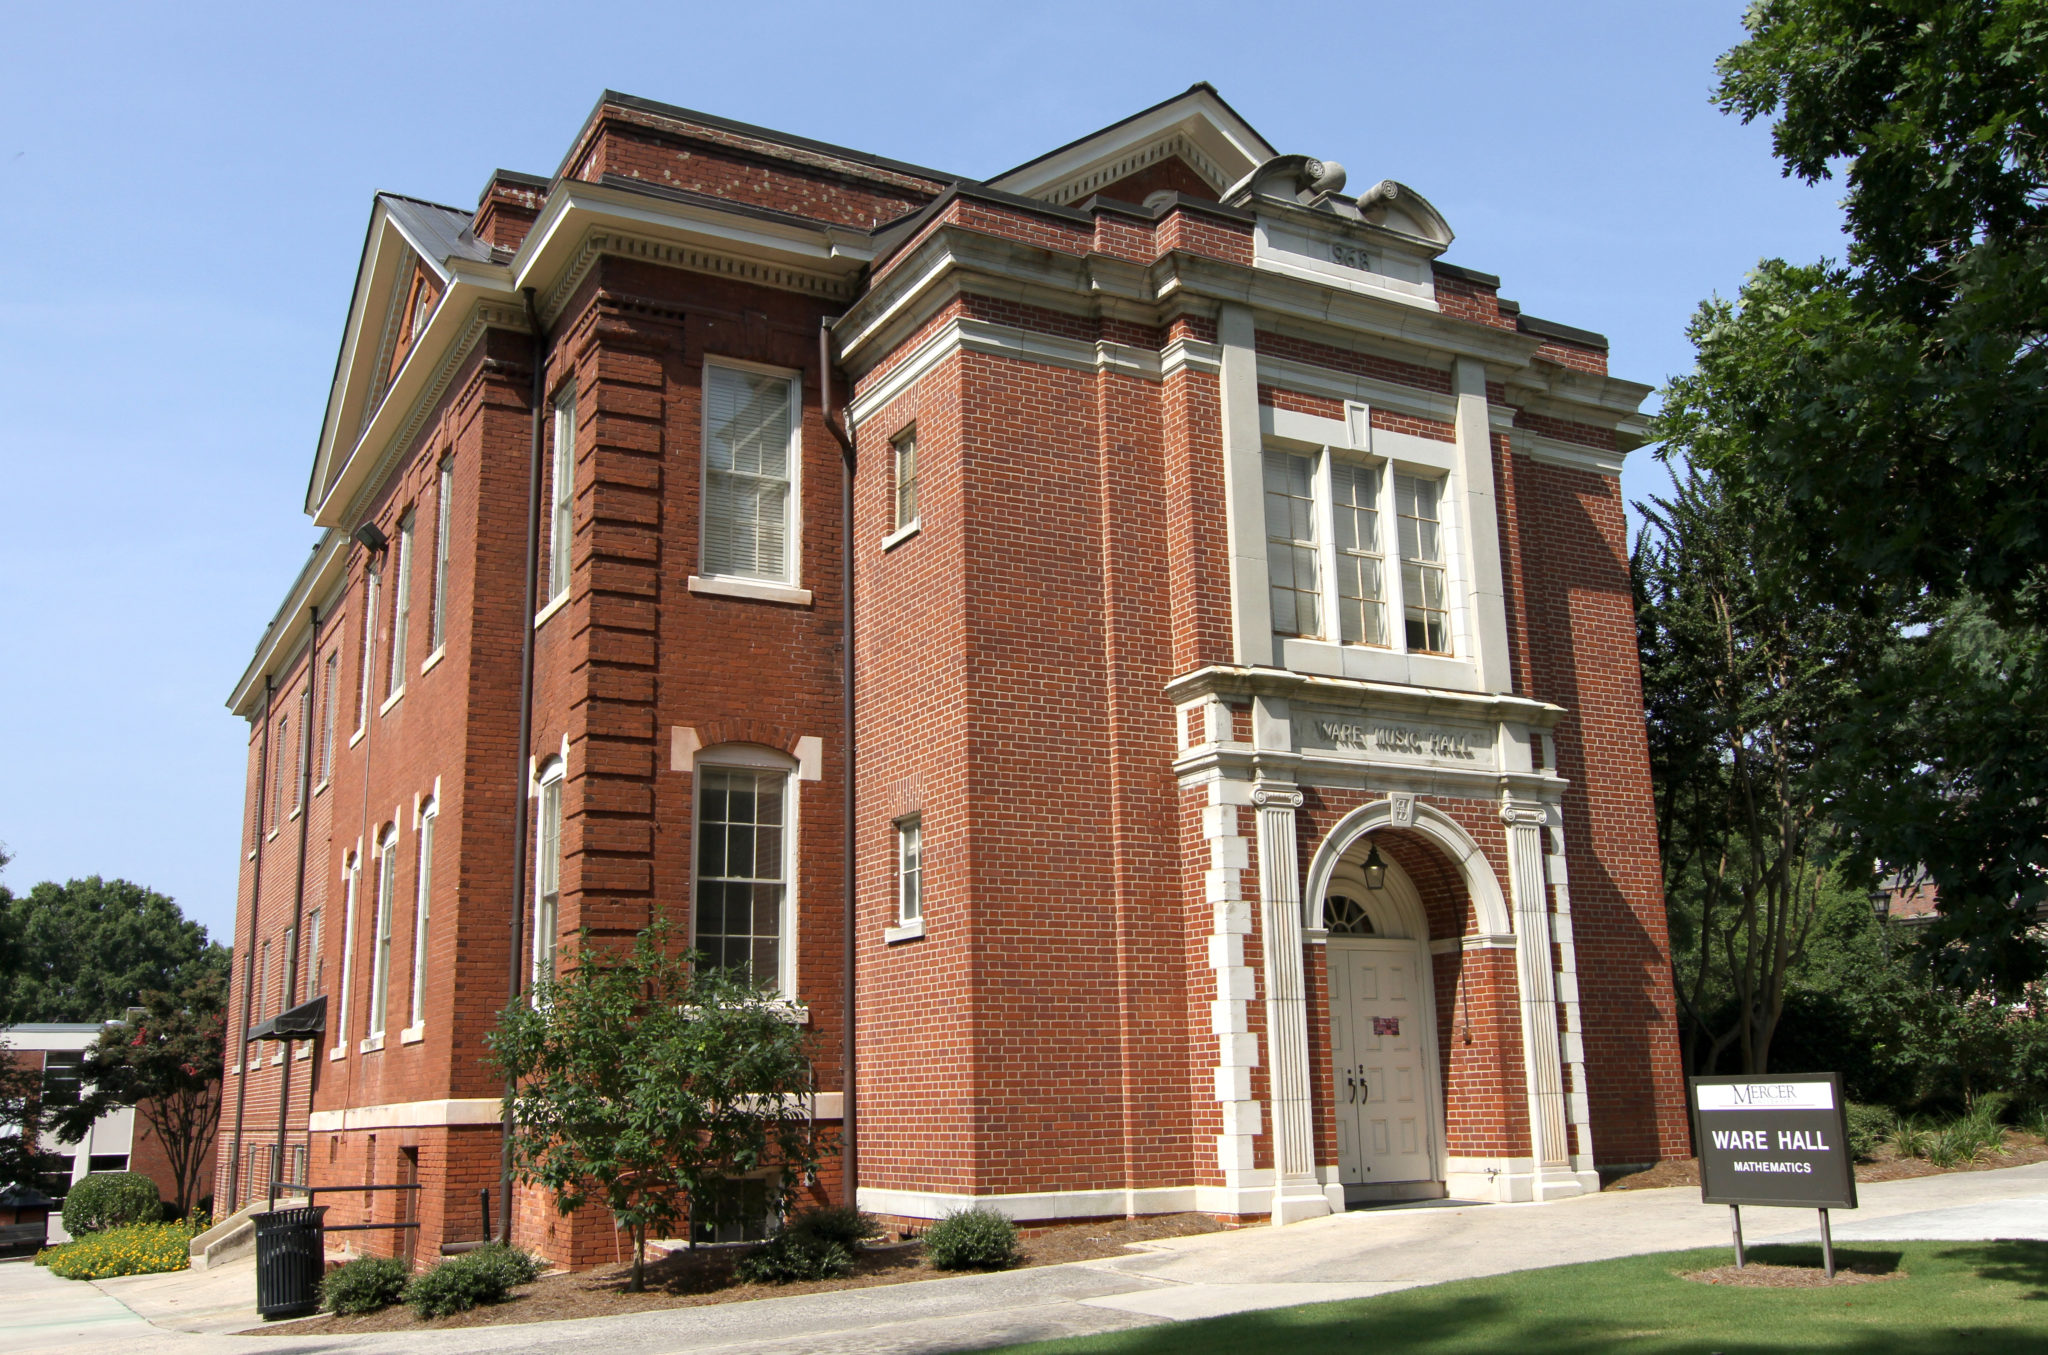 Ware Hall